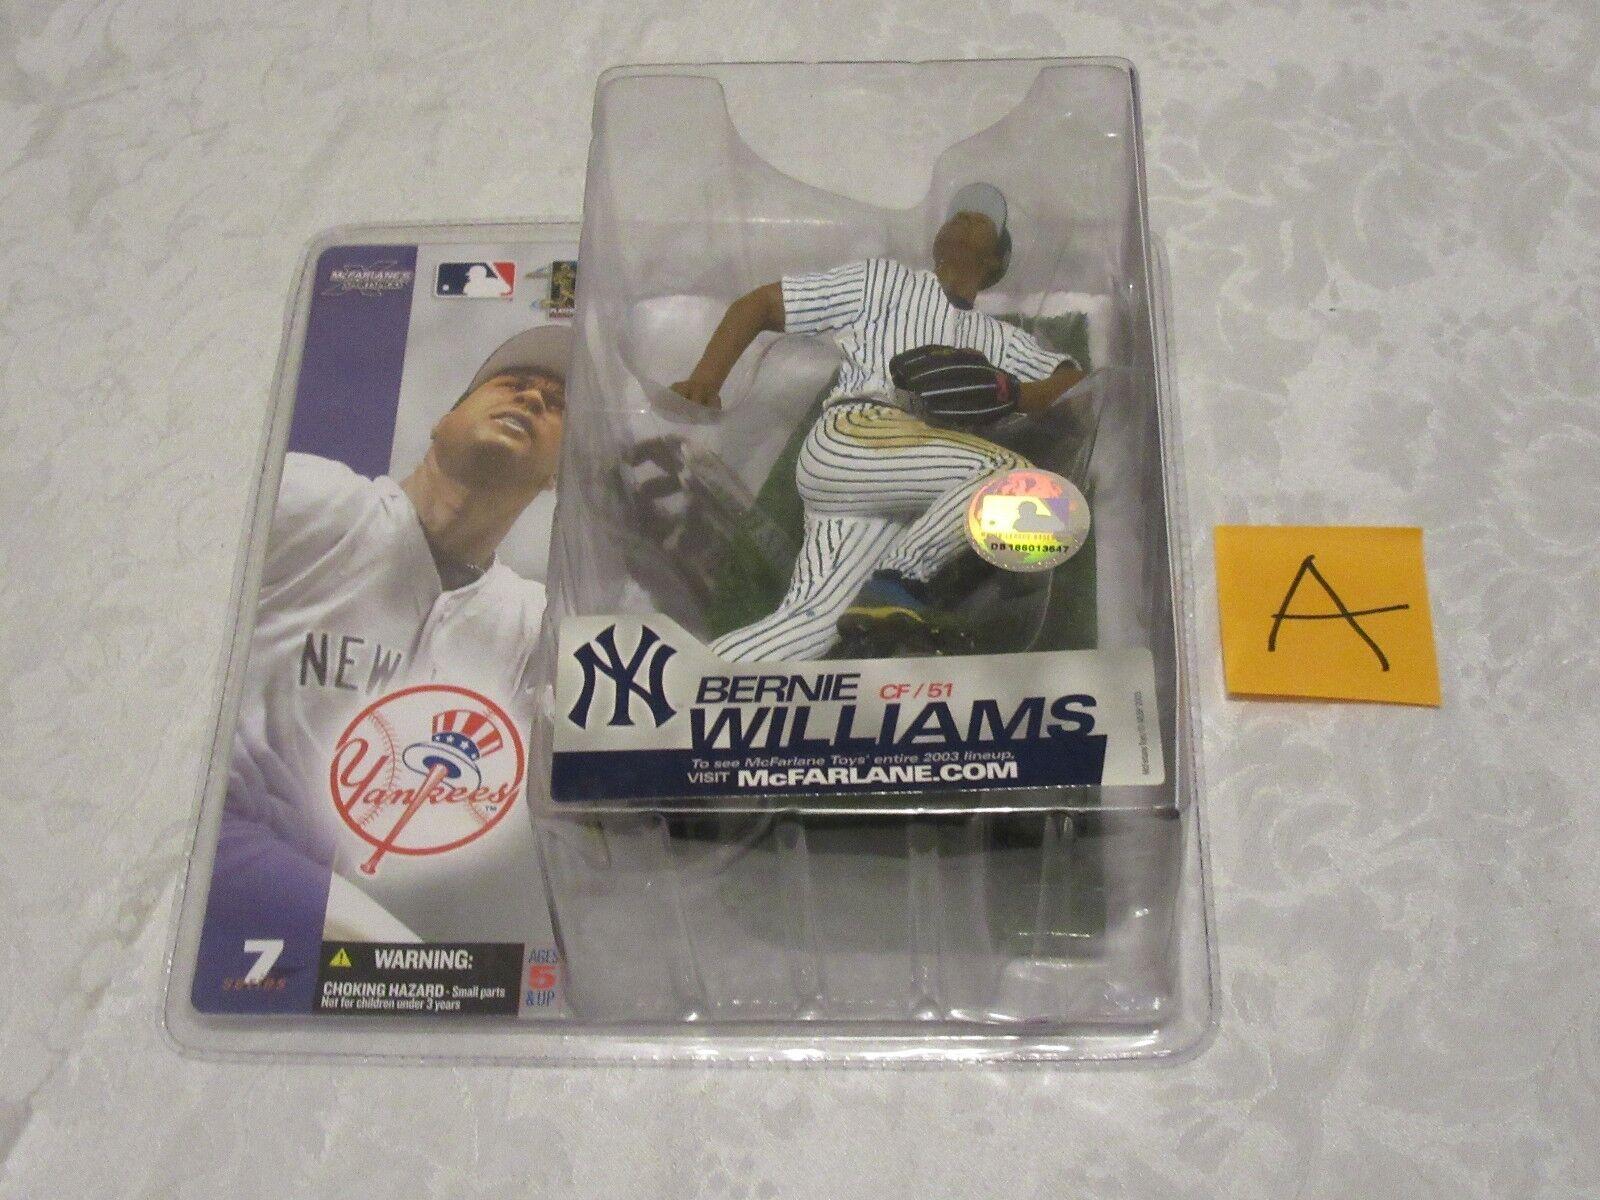 McFarlane MLB Series 7 Bernie Williams Chase Variant NY Yankees Pinstripes A